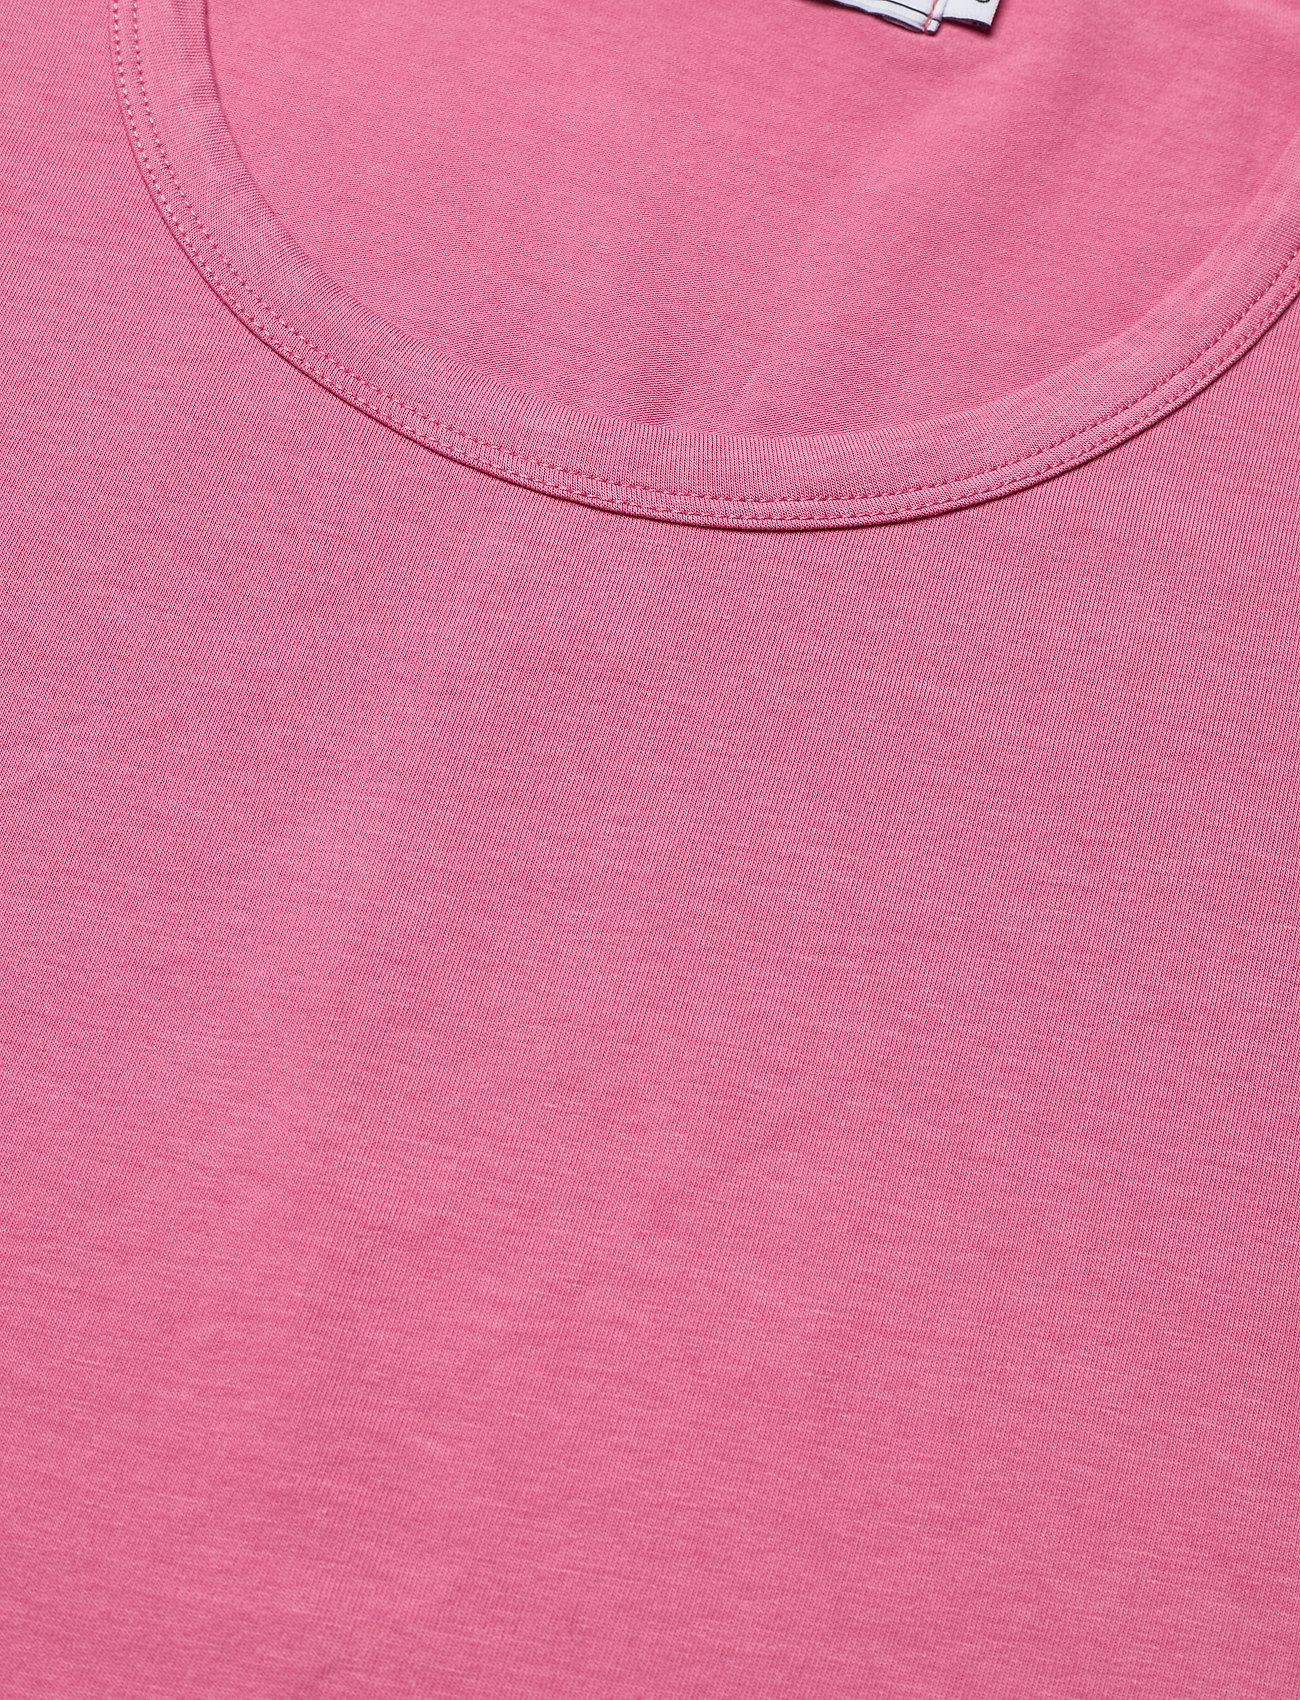 Arnie Says - Hadley Cotton - t-shirt & tops - pink - 3